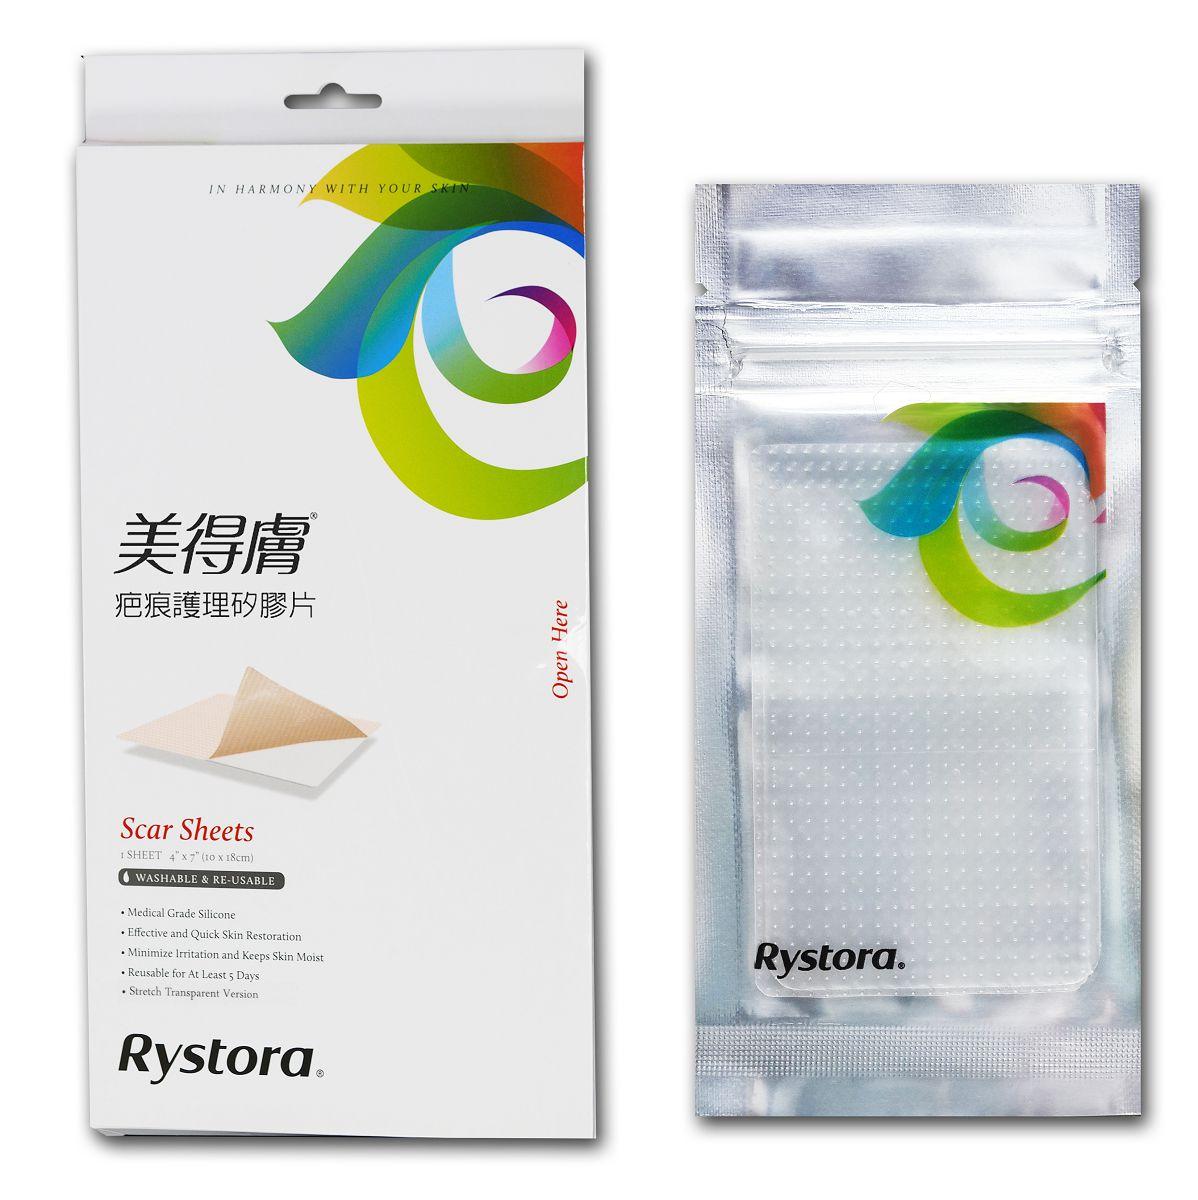 Fortune Medical Instrument Corporation-Rystora Scar Sheet